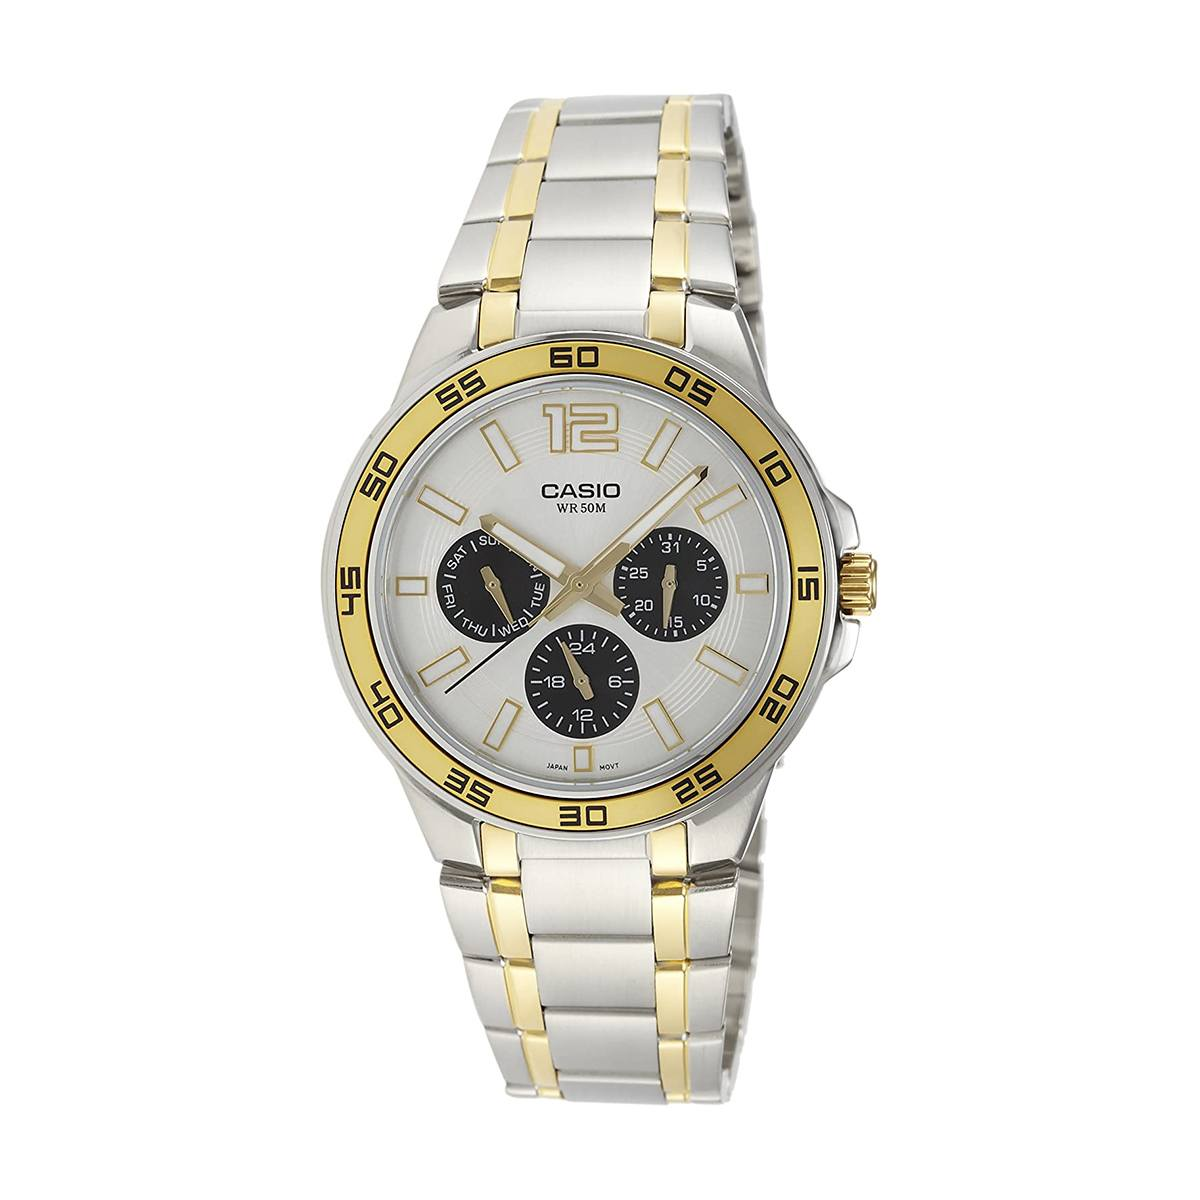 Часовник Casio MTP-1300SG-7AV